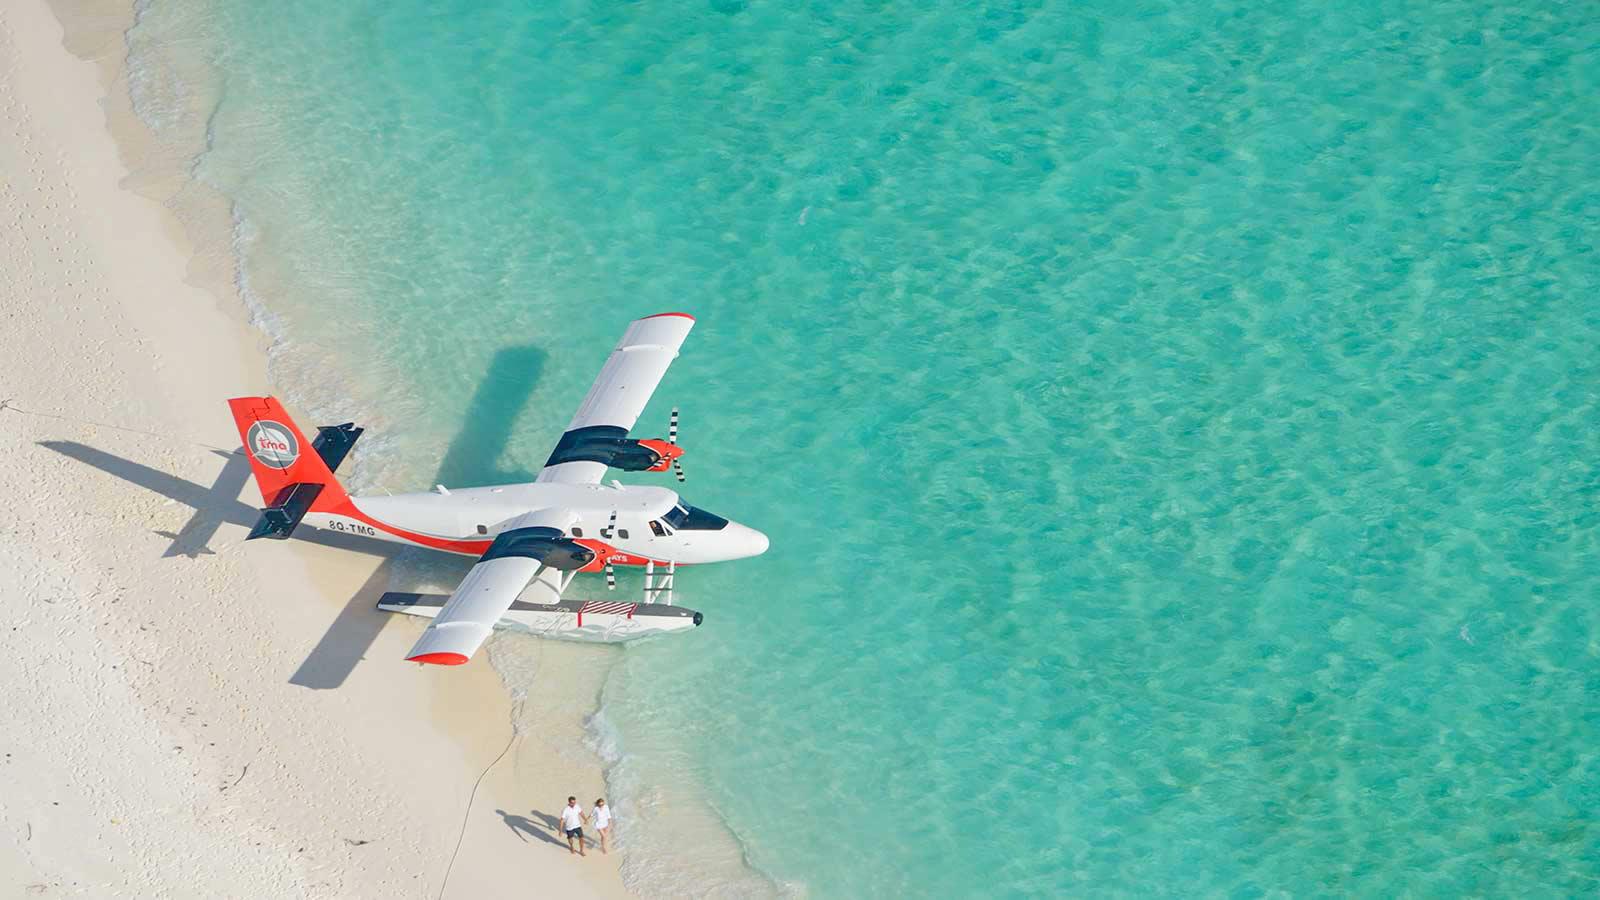 Hideaway Beach Resort & Spa Запускает Трансфер на Гидросамолете